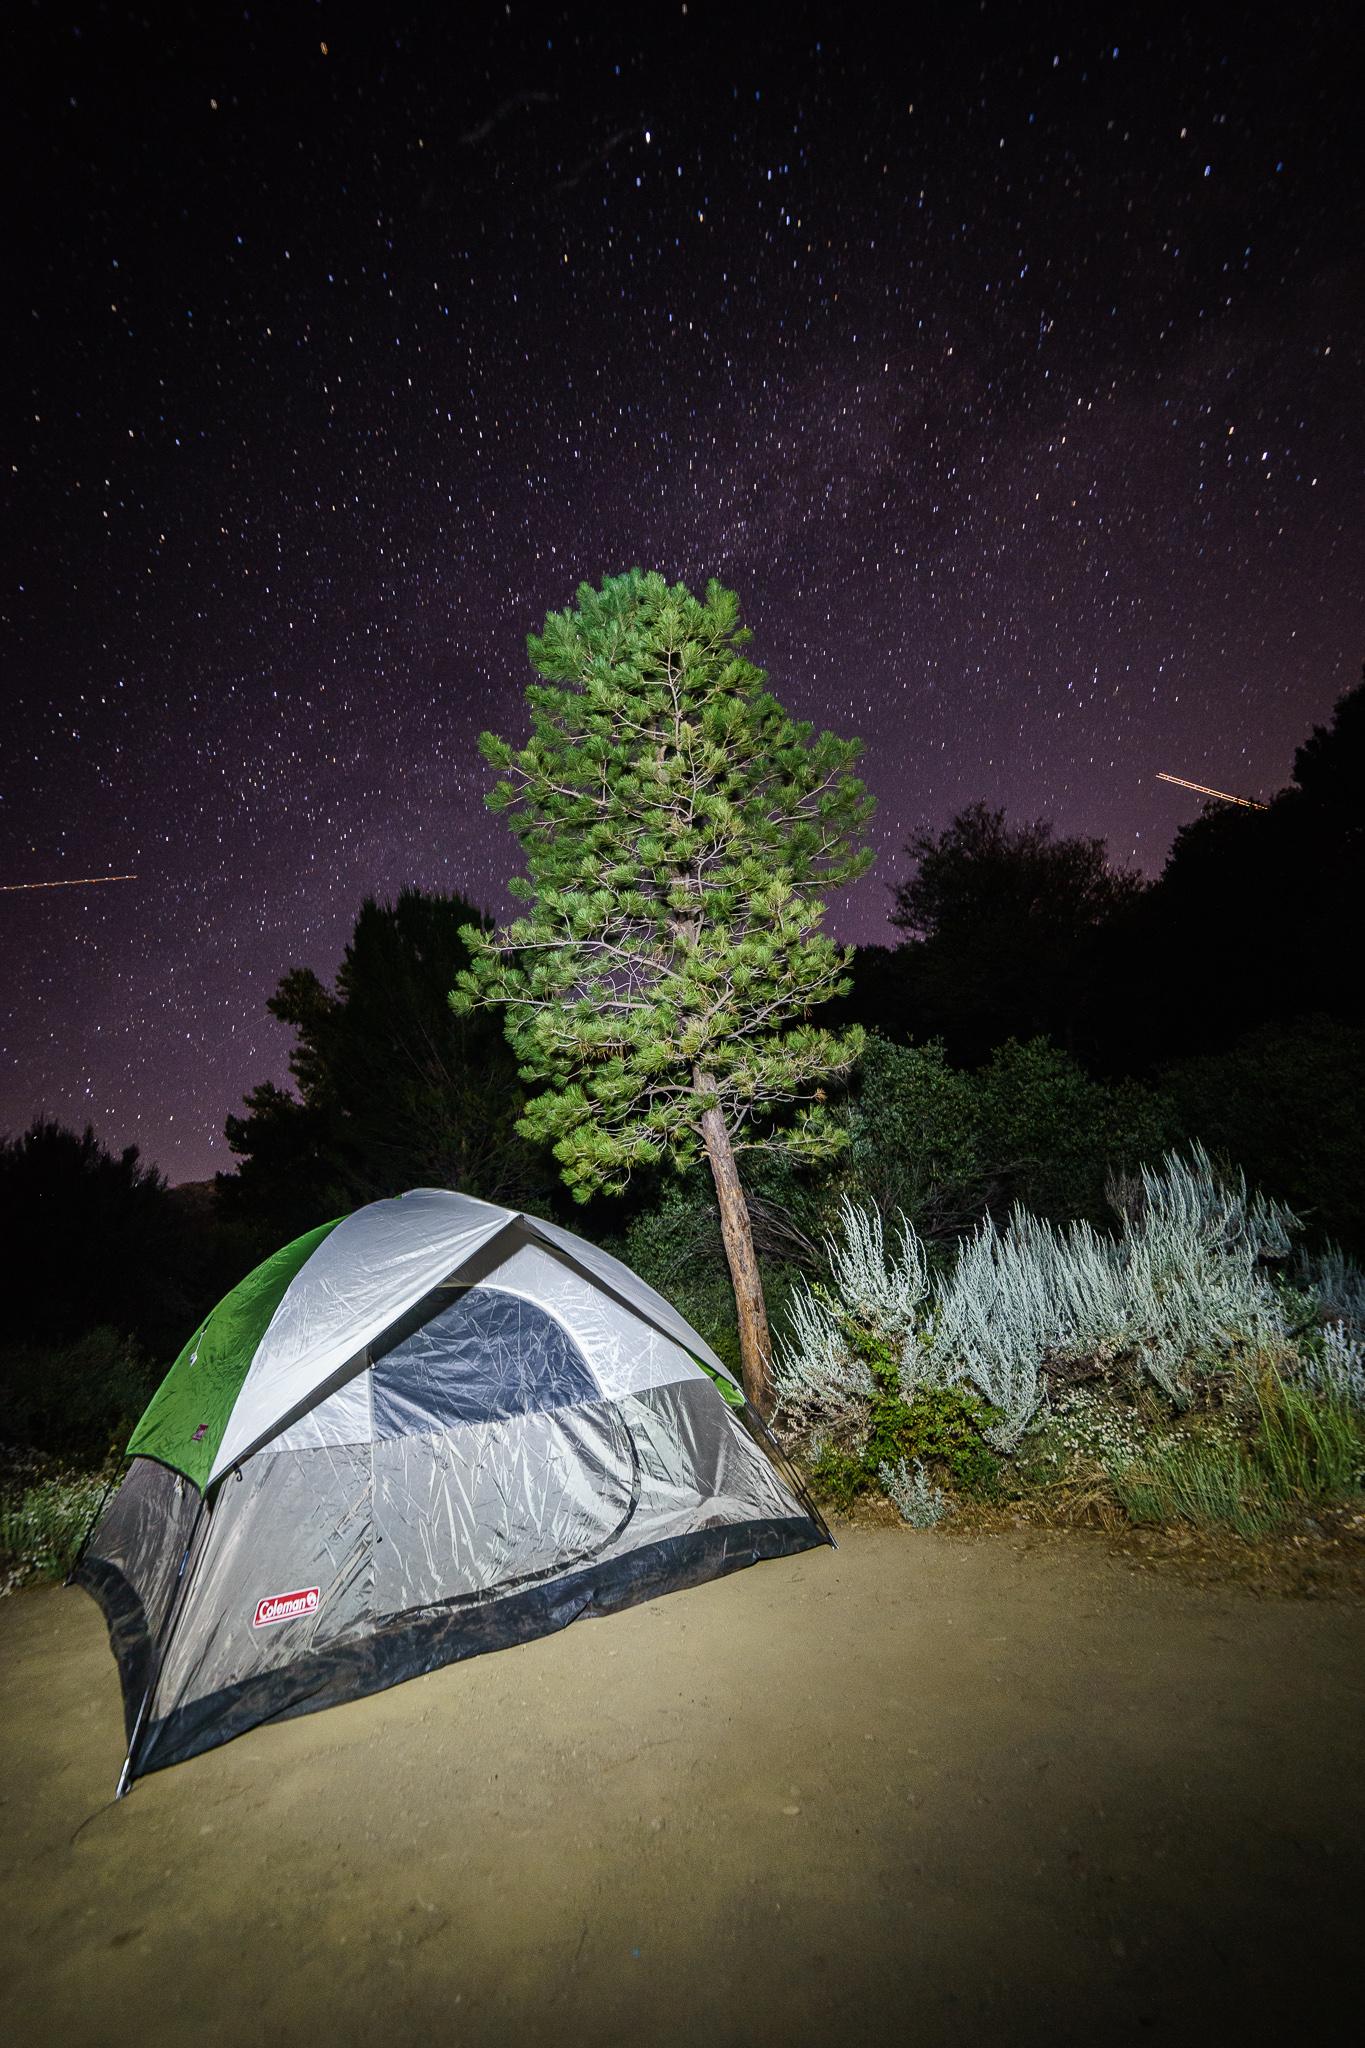 Camping July 4th 2014_003-2.jpg